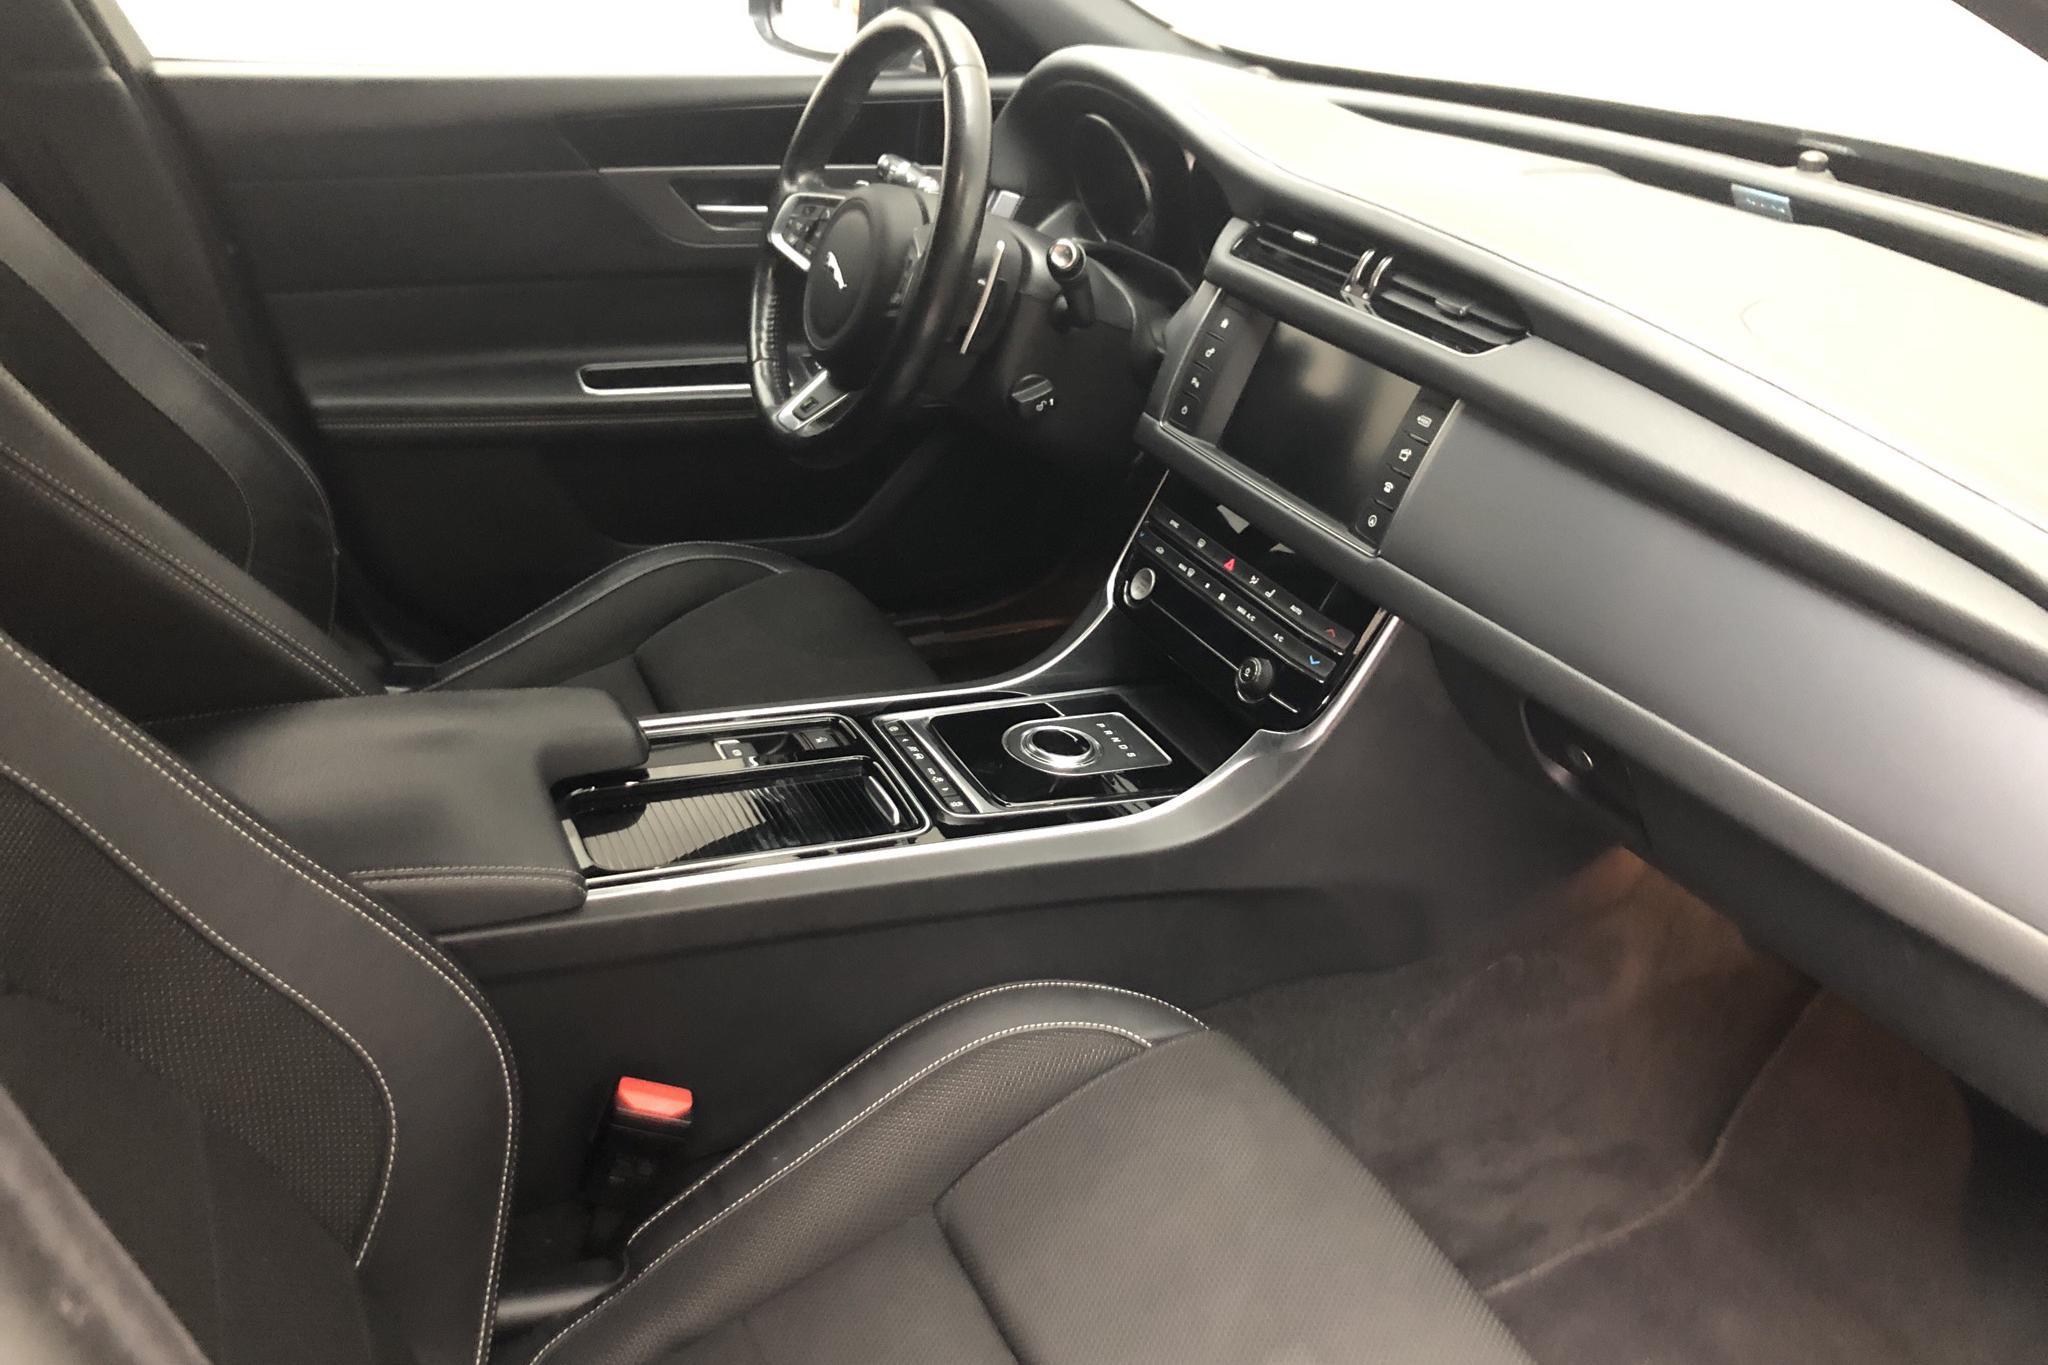 Jaguar XF 2.0D Sportbrake RWD (180hk) - 115 450 km - Automatic - black - 2018